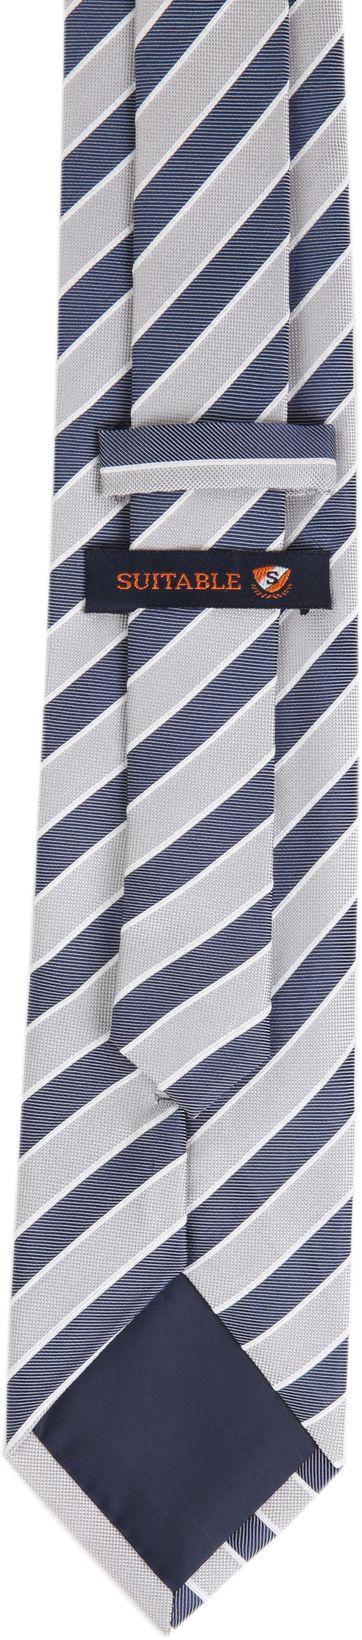 Krawatte Seide Dunkelblau Grau Streifen